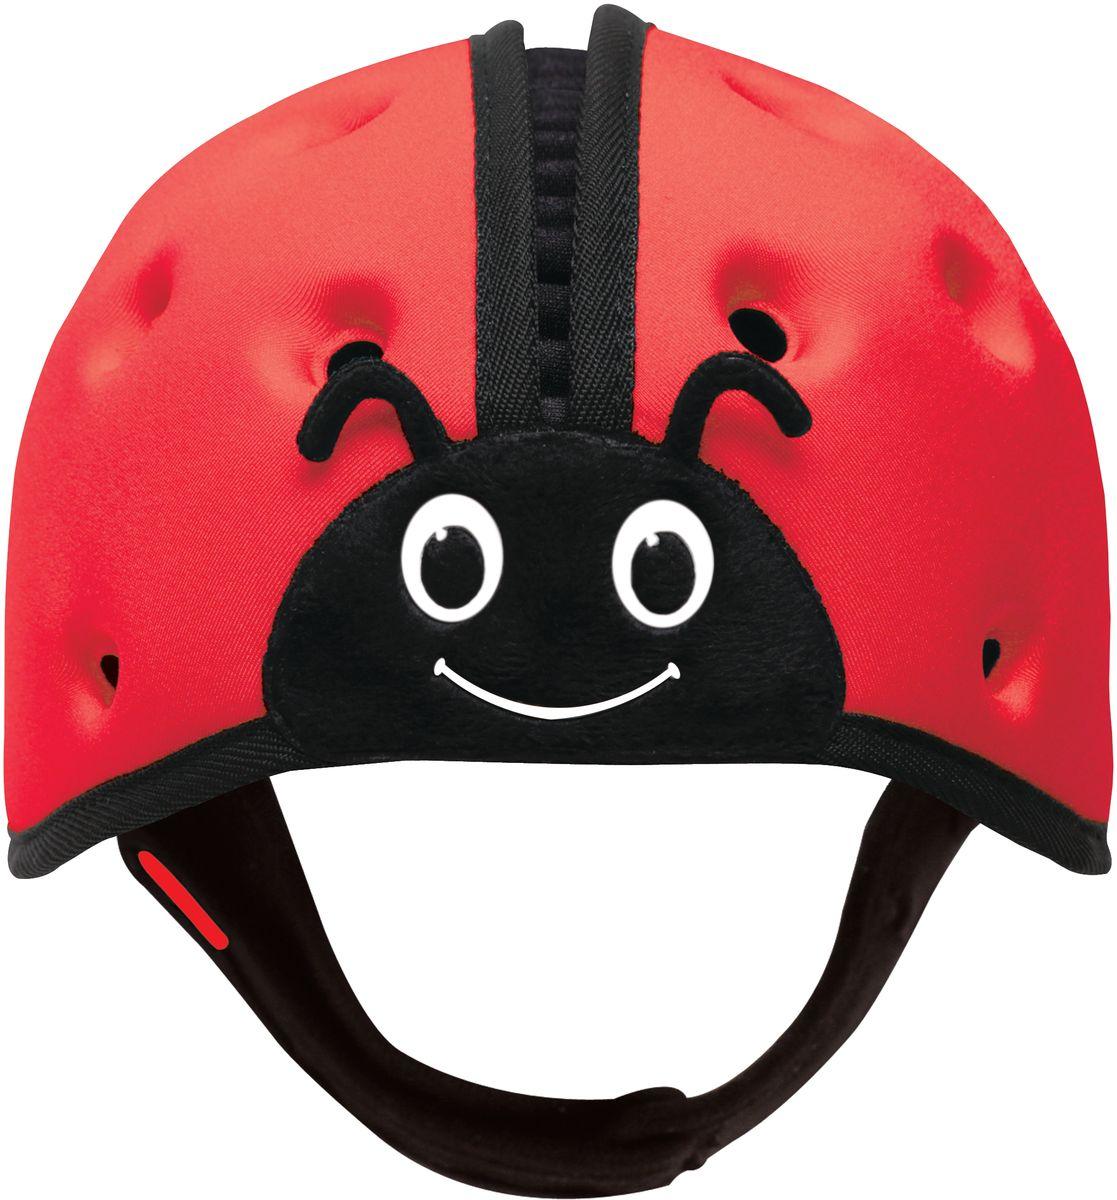 SafeheadBABY Шапка-шлем Божья коровка цвет красный